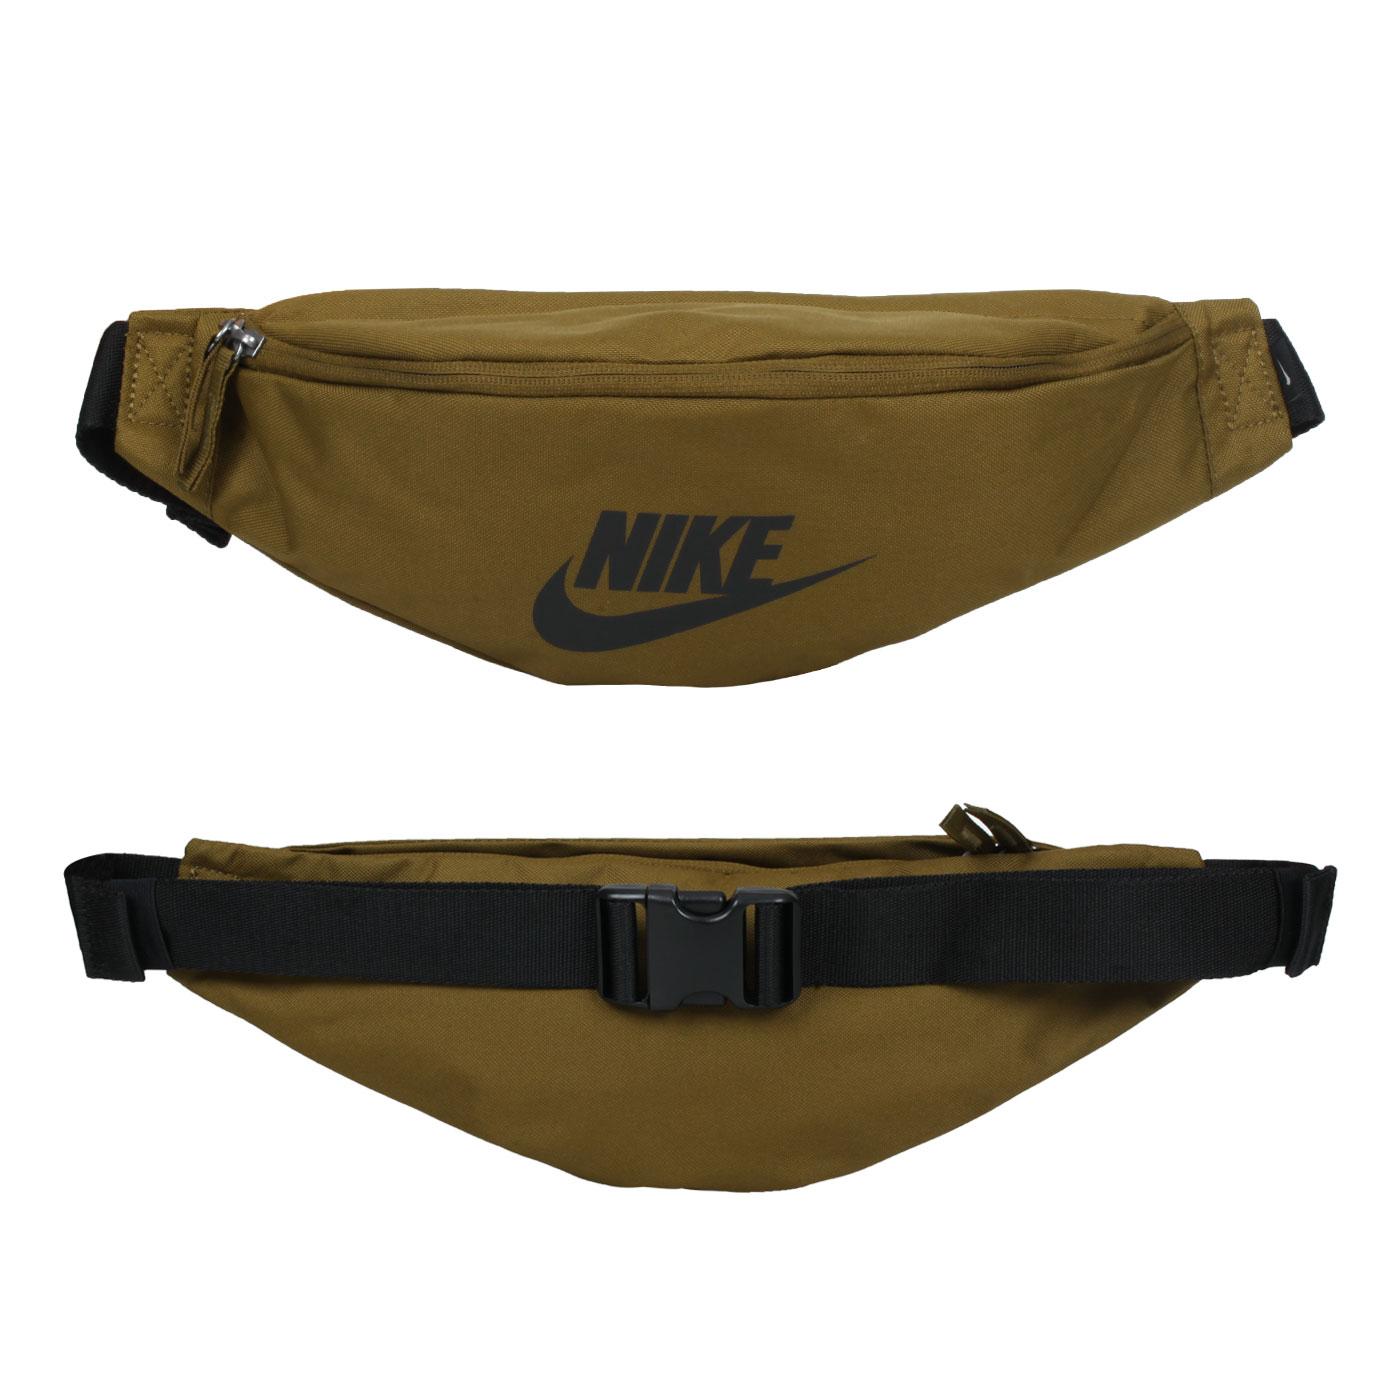 NIKE 運動腰包 BA5750-368 - 橄欖綠黑